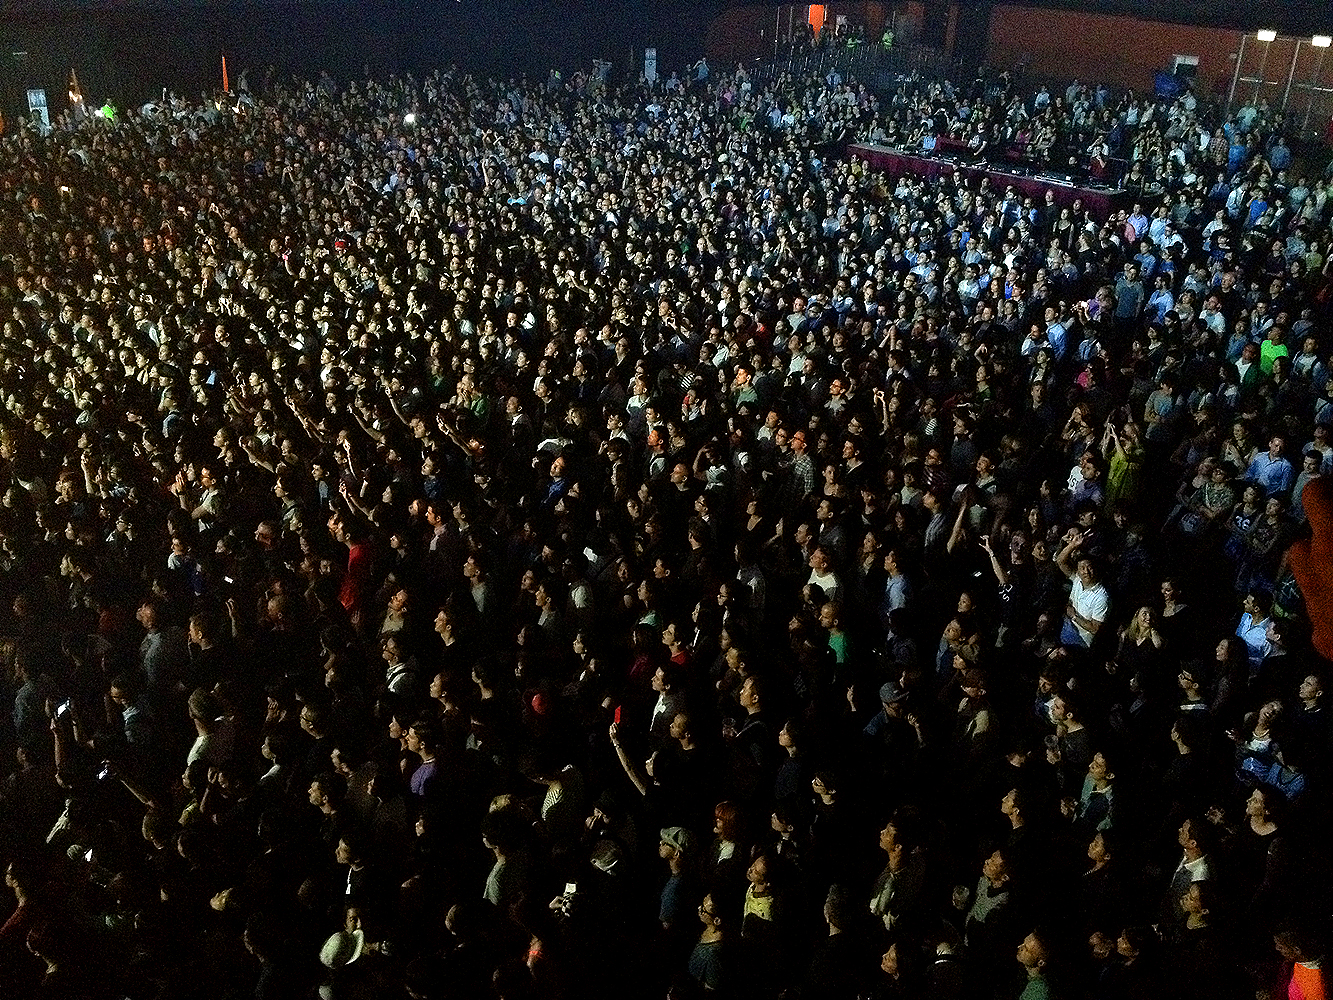 the xx live in hk concert hong kong show kitec band kowloon bay china tour